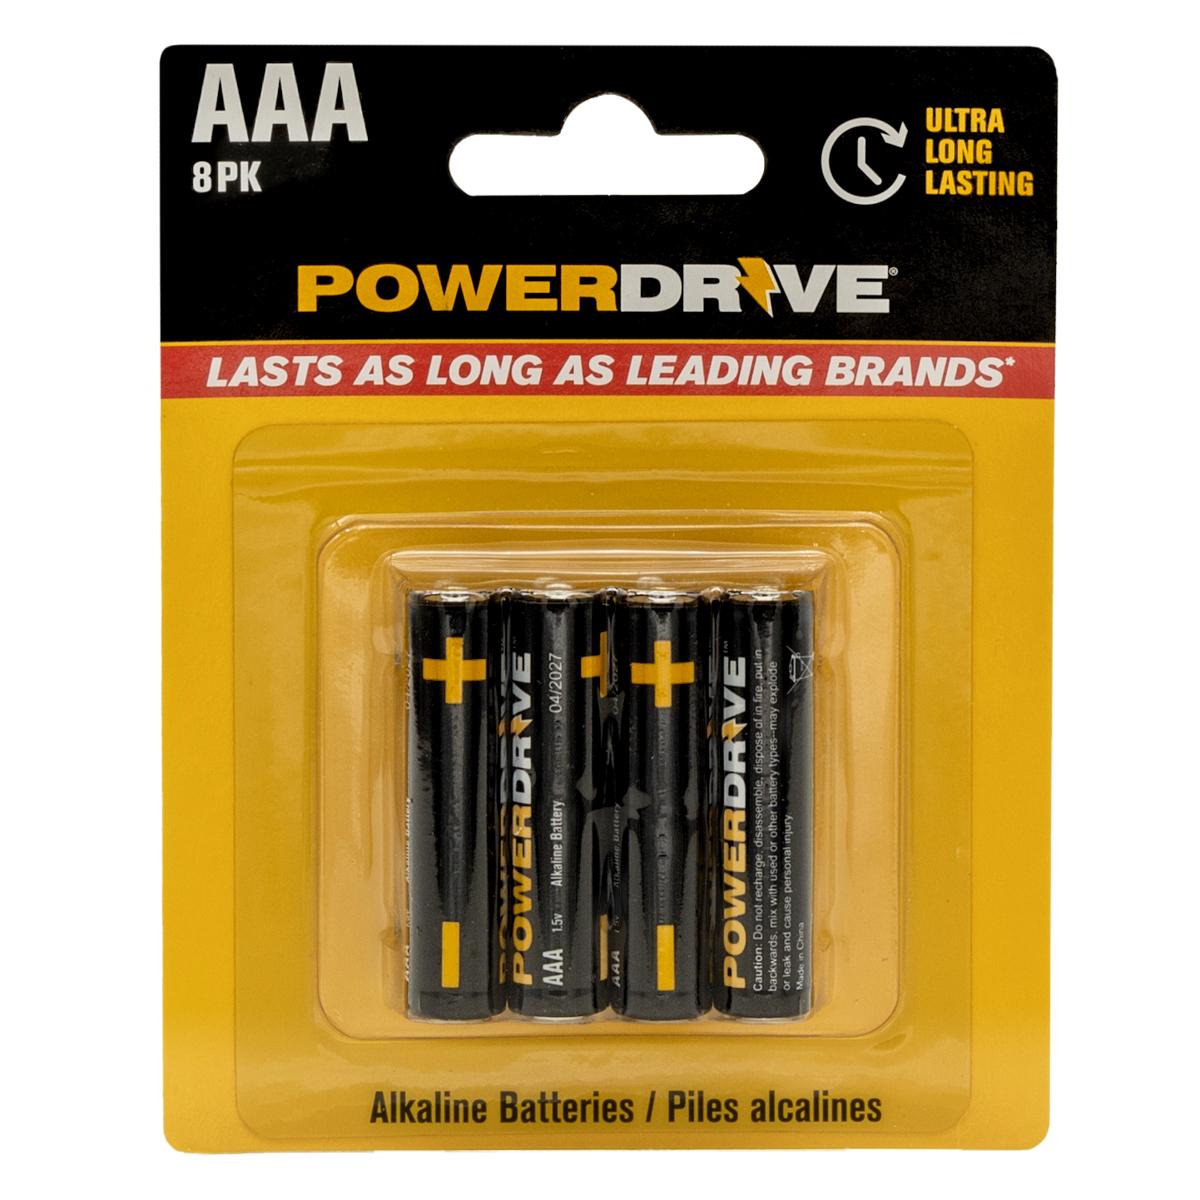 Power Drive AAA - 8PK 6PC PDQ